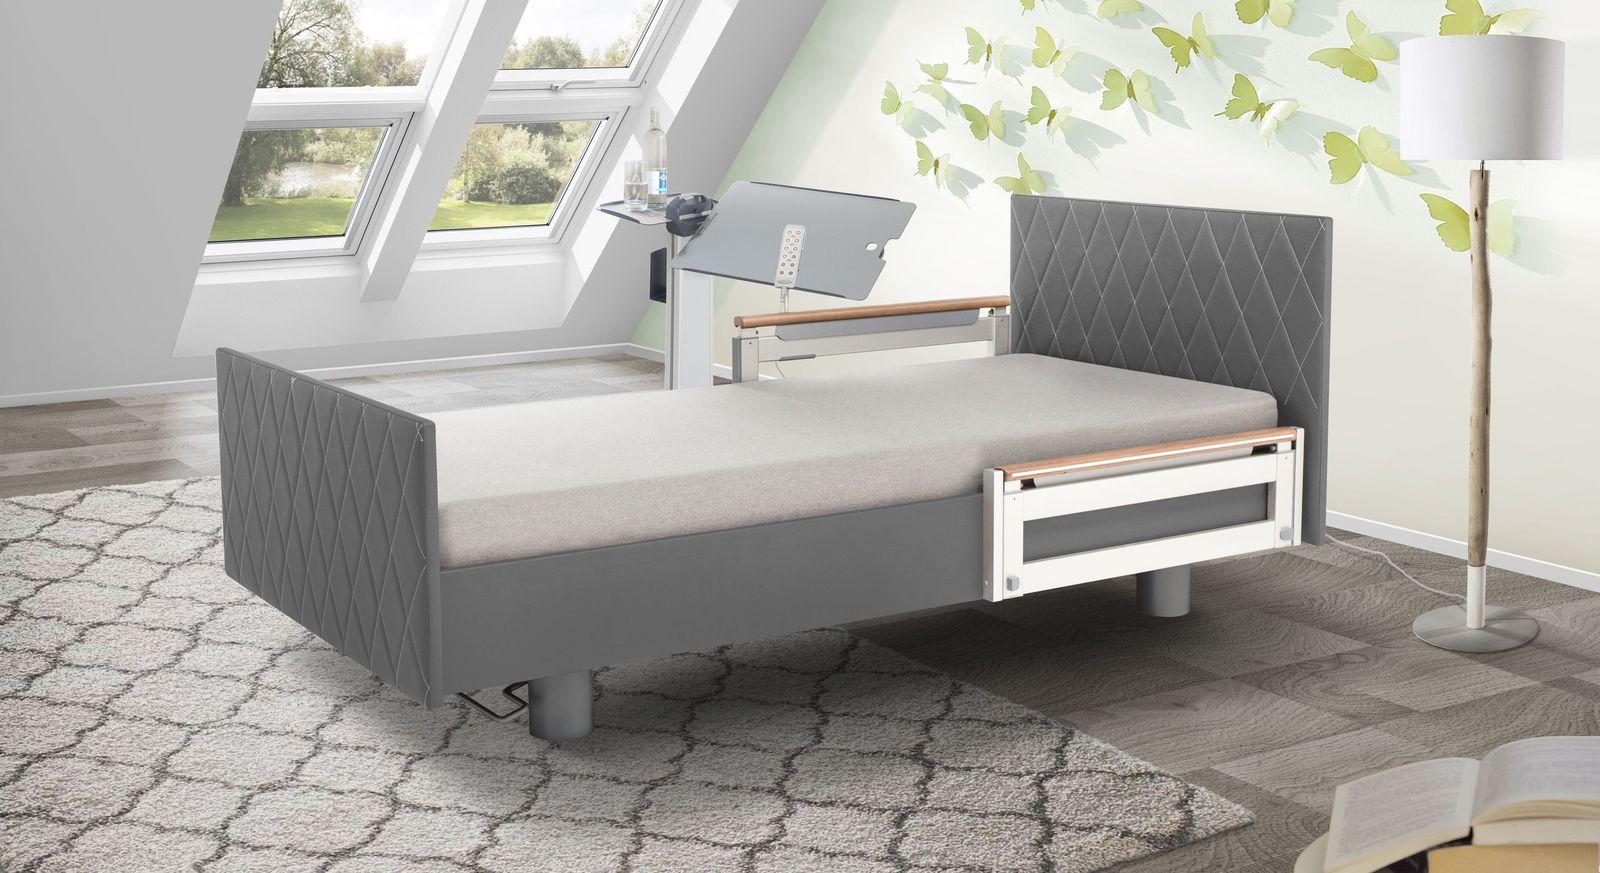 Komfortbett mit Pflegebett-Funktion Borkum mit platinfarbenem Kunstlederbezug